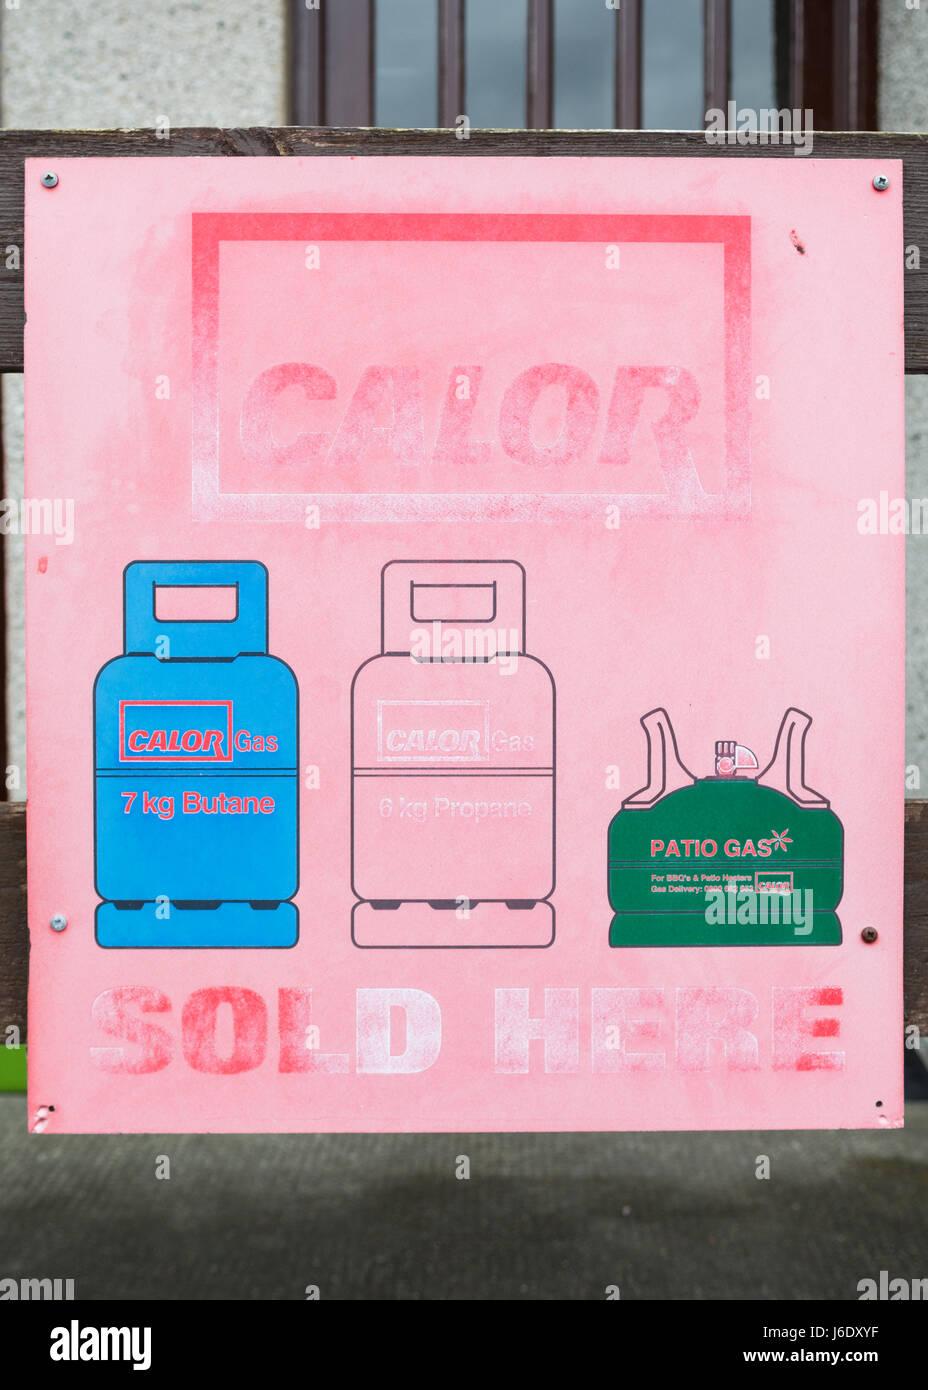 Calor Gas butane, propane, patio gas for sale sign - Stock Image